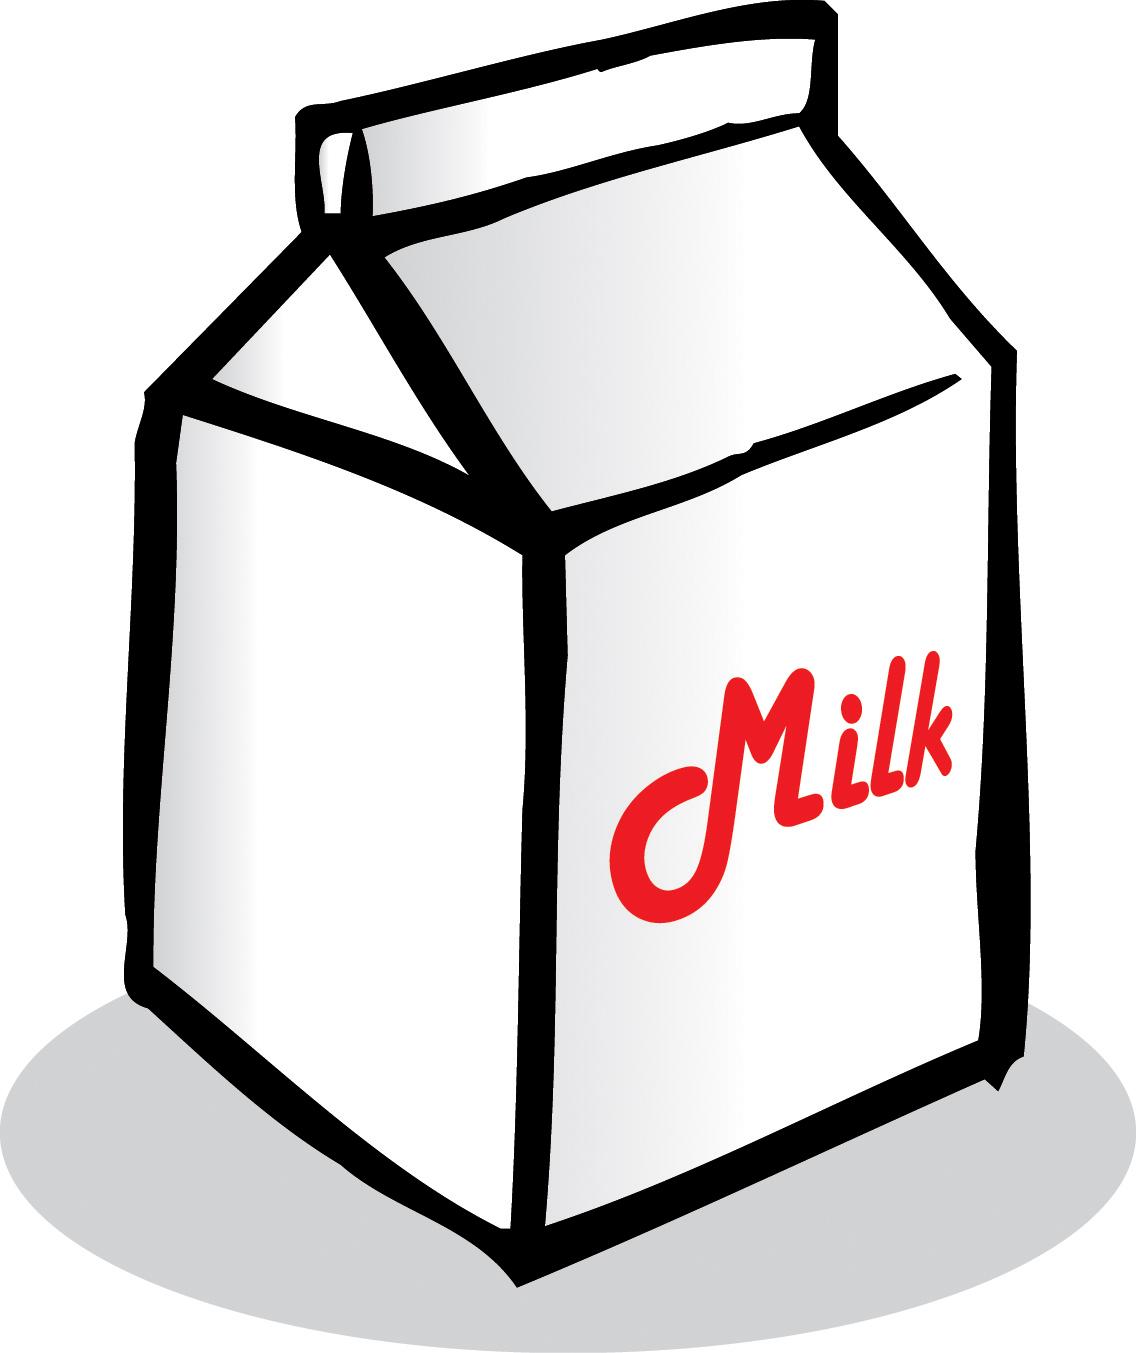 milk carton clipart black and - Milk Carton Clipart